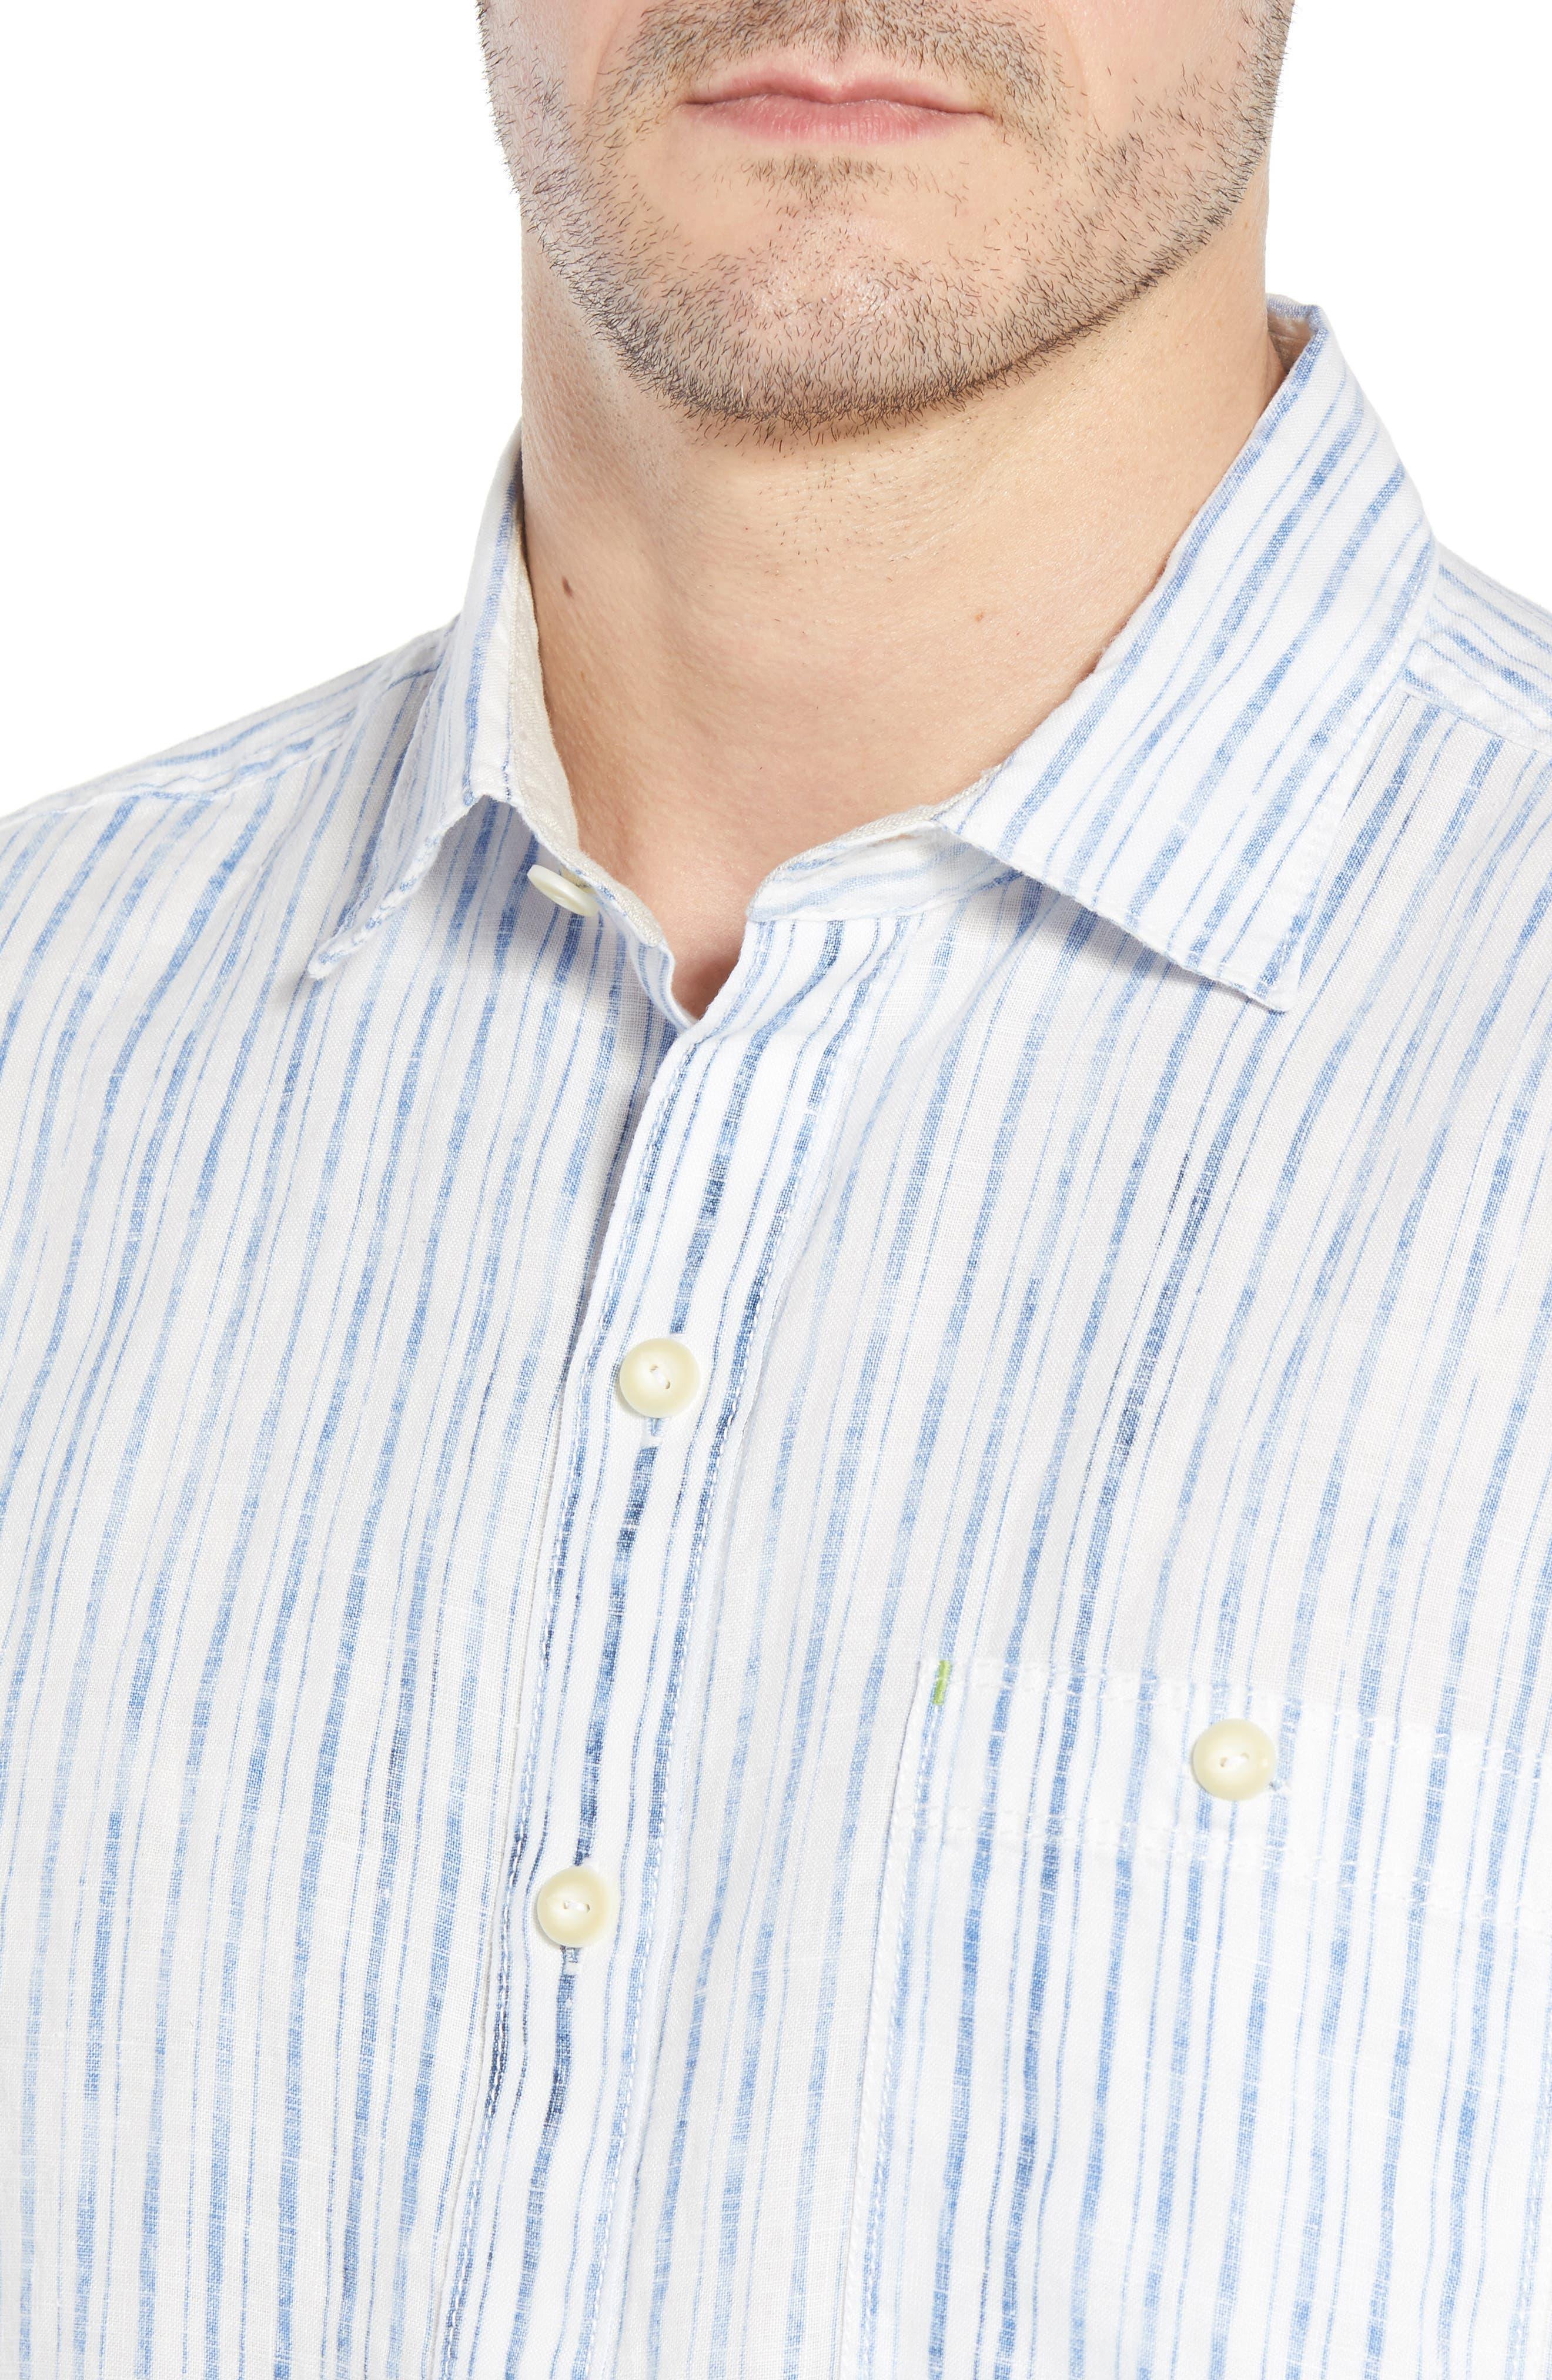 Del Soul Stripe Linen Sport Shirt,                             Alternate thumbnail 2, color,                             Blue Spark